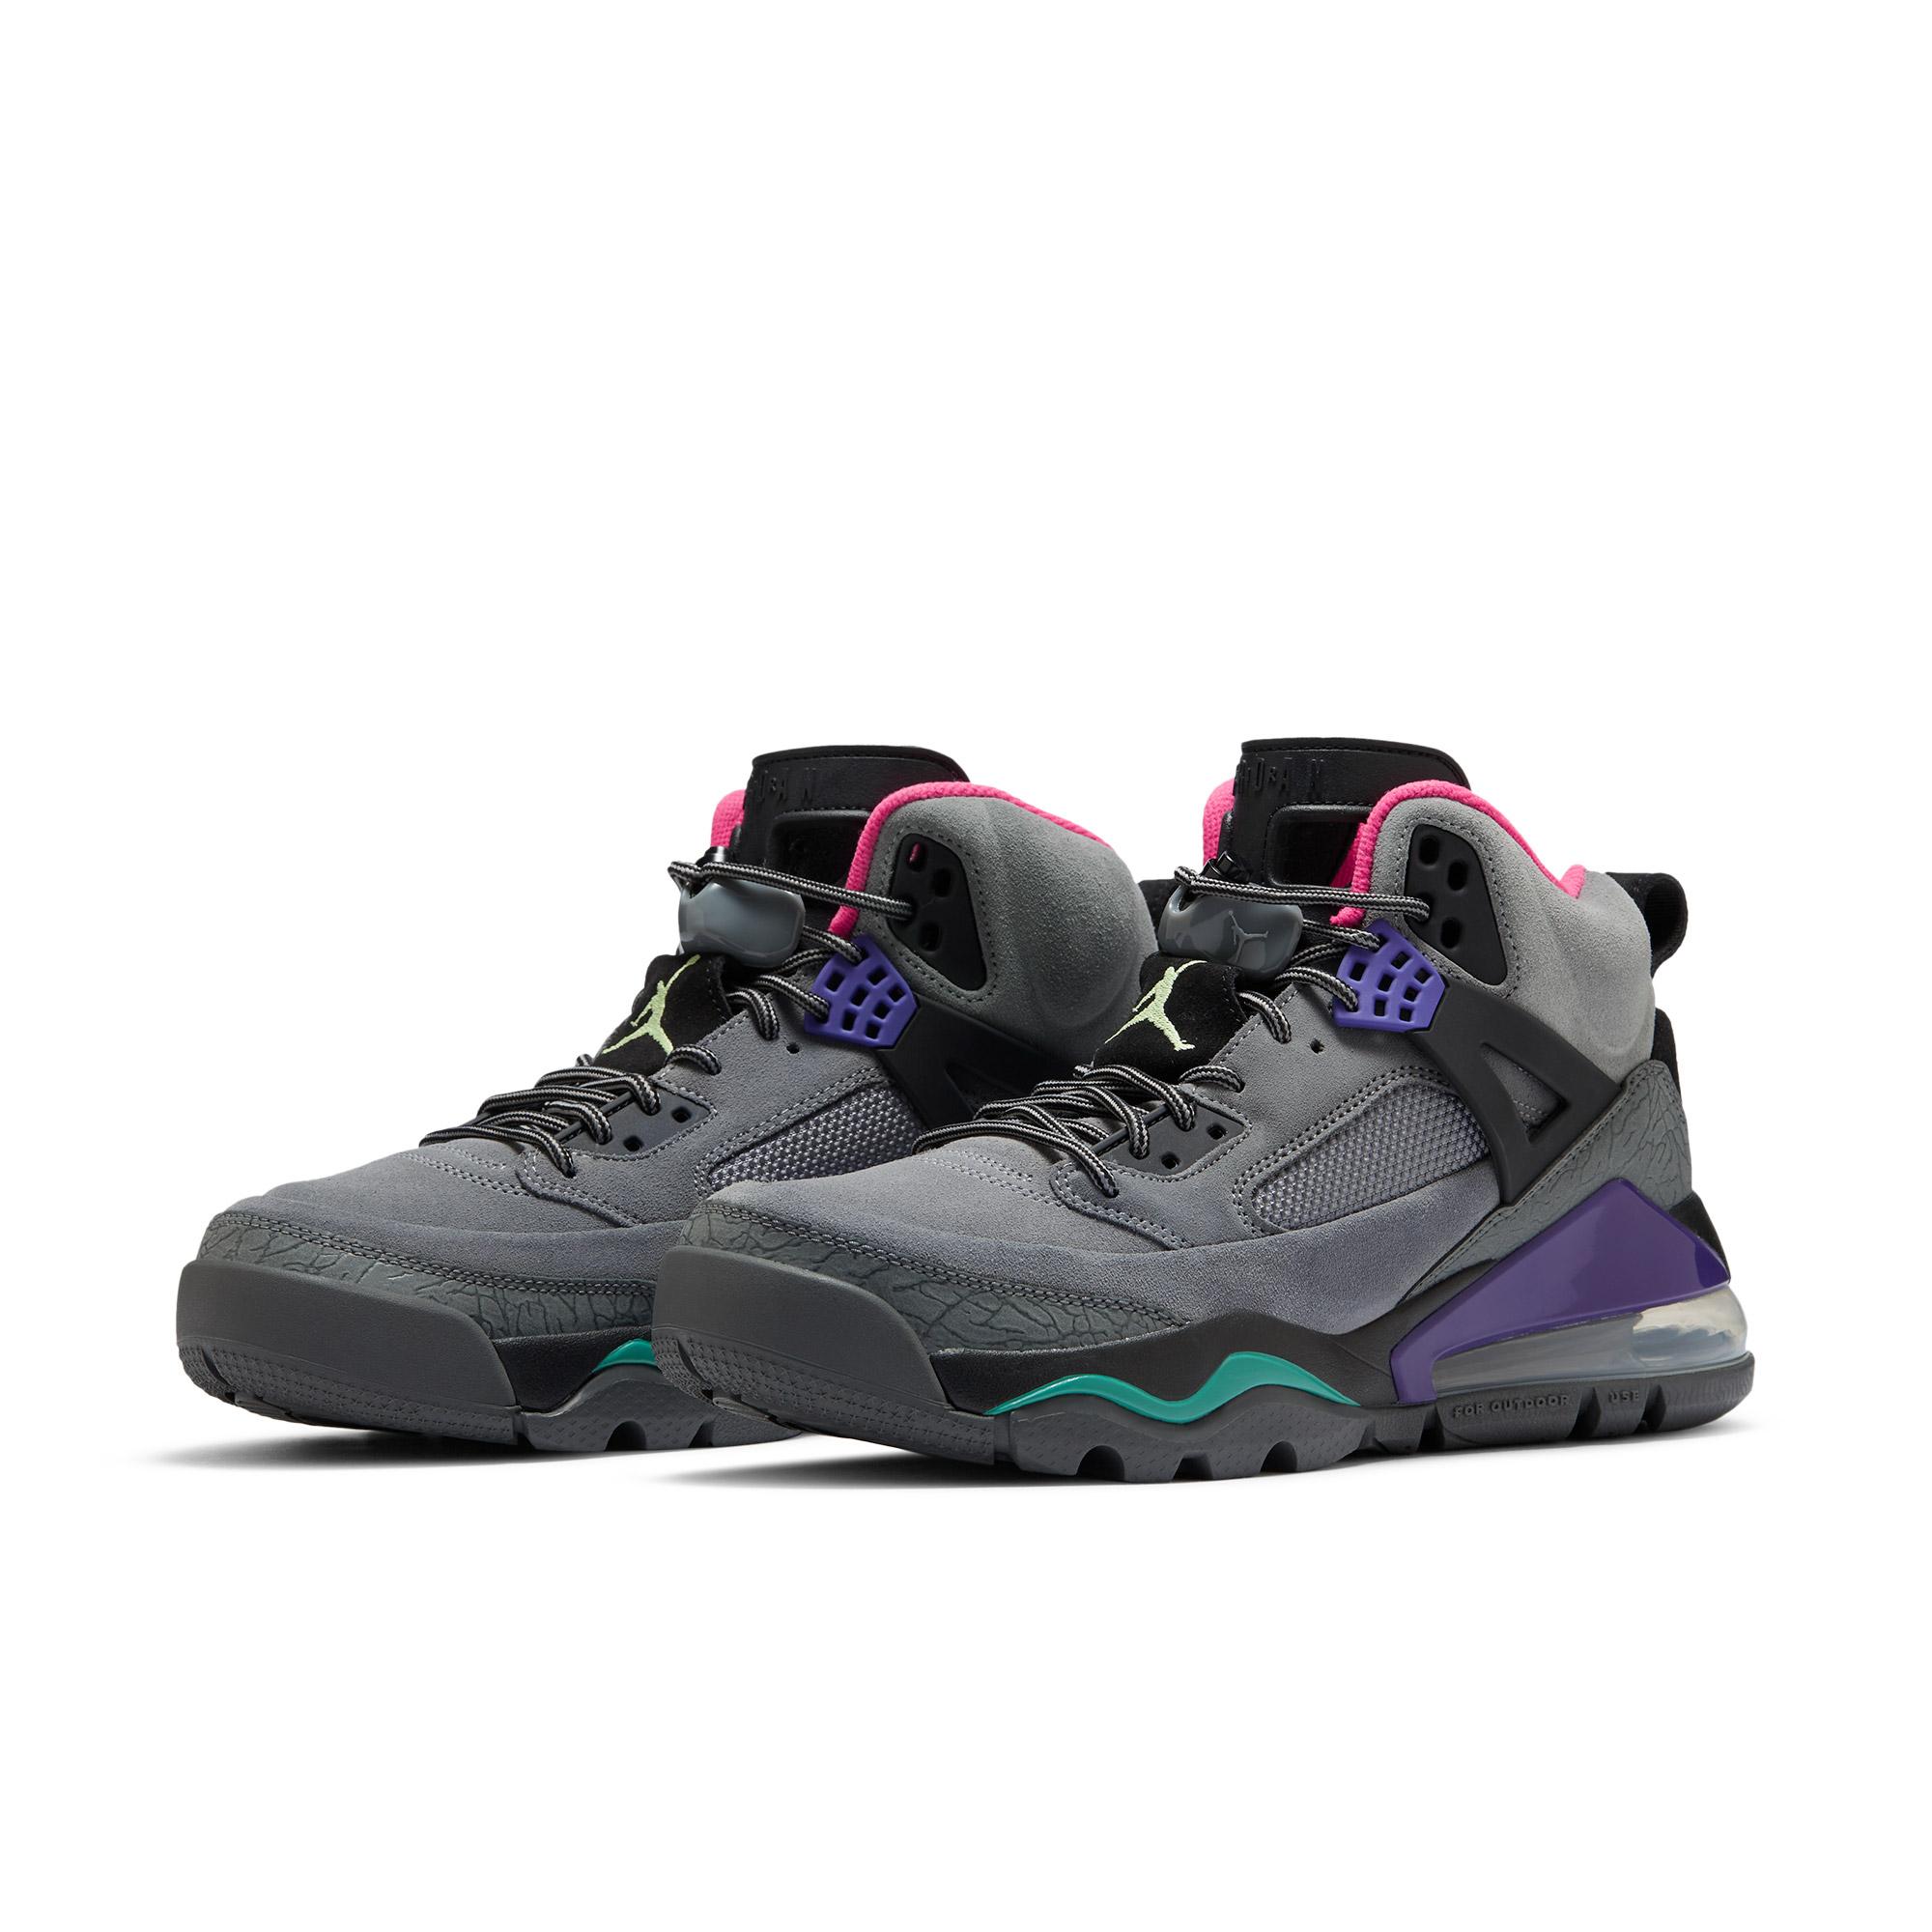 AIR JORDAN Jordan spizike 270 boot 男士休闲运动鞋 CT1014-002 烟灰/微黄绿/黑/海神绿/西瓜红/庭紫